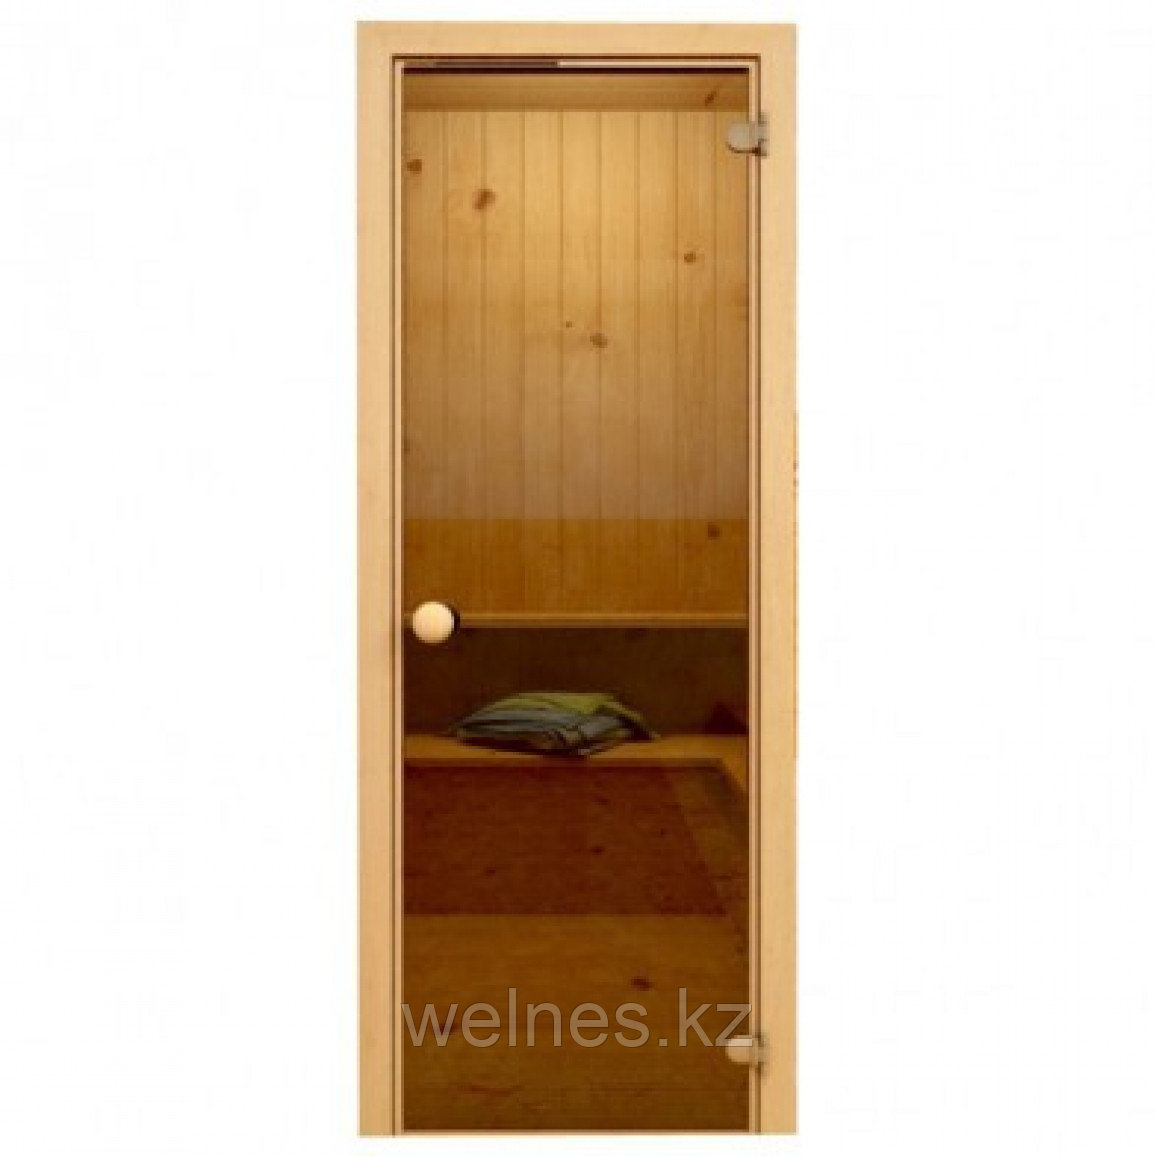 Дверь Hot Line #1232 (бронза, береза)